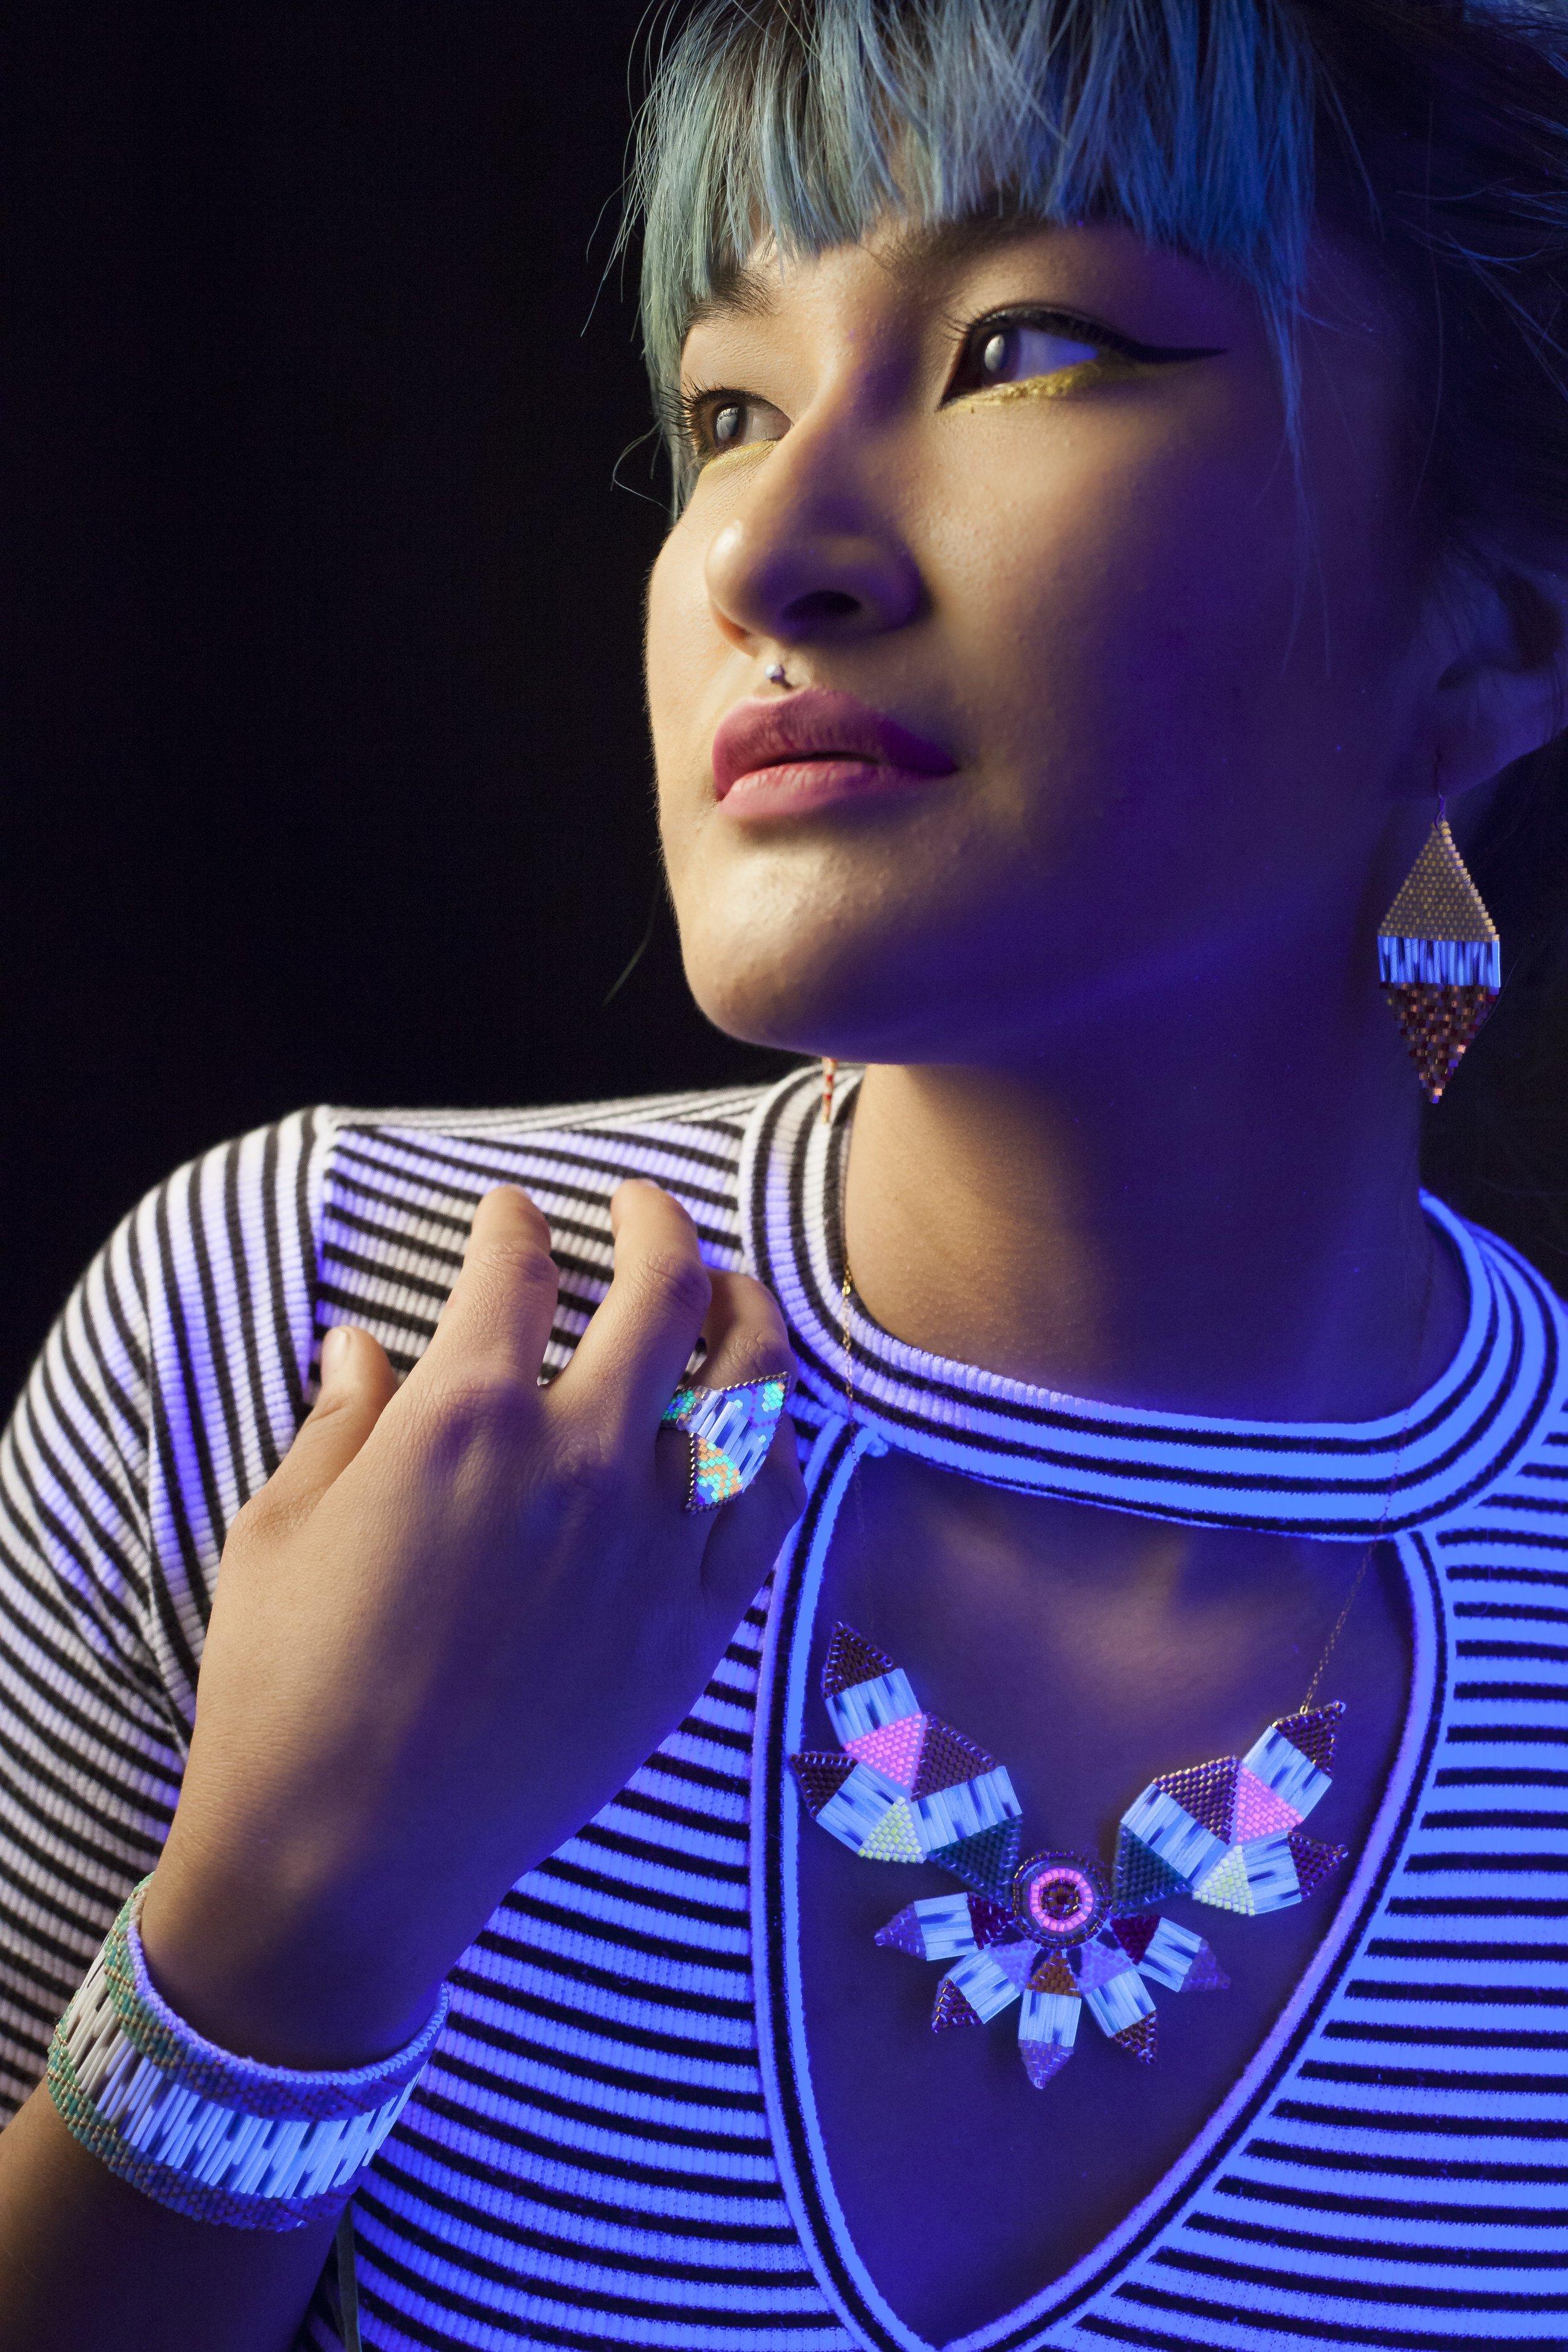 Jewellery; Neon Ookpik Necklace, Neon Beaded Cuff, Neon Shield Earrings. Photo Courtesy of Jaida Greyeagle.